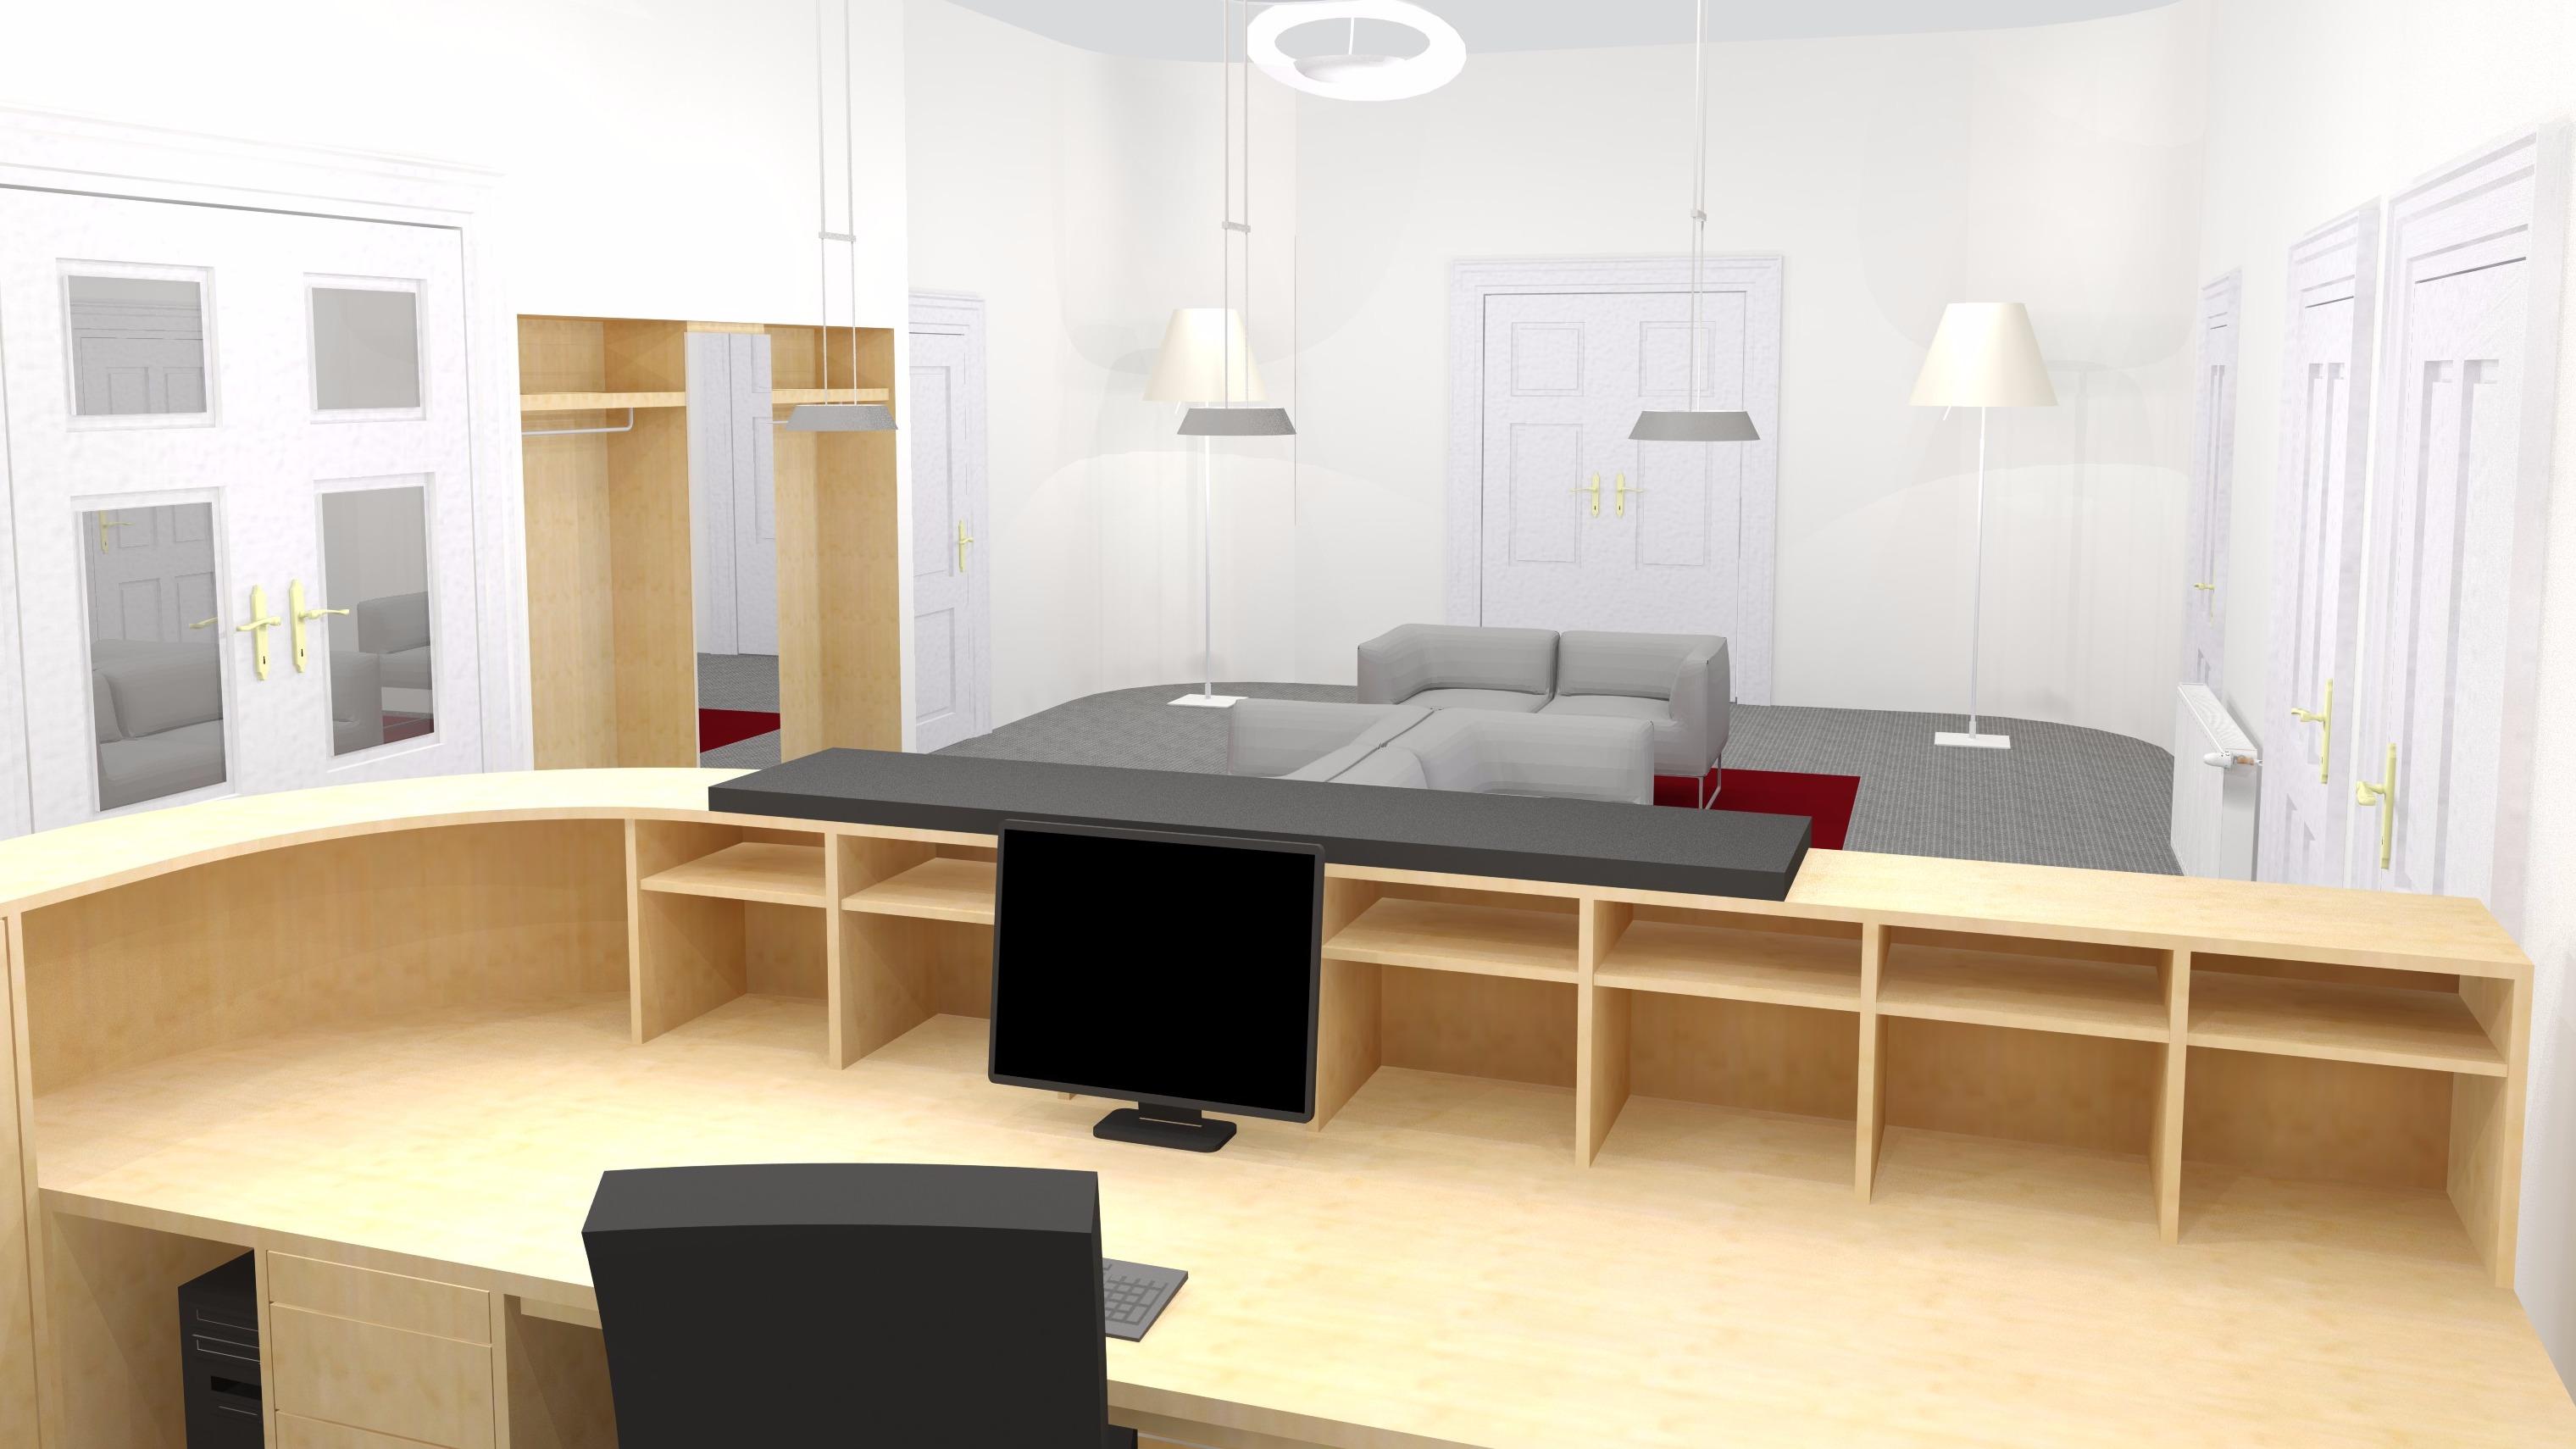 Architekturbüro Mehring GbR   Innenarchitektur